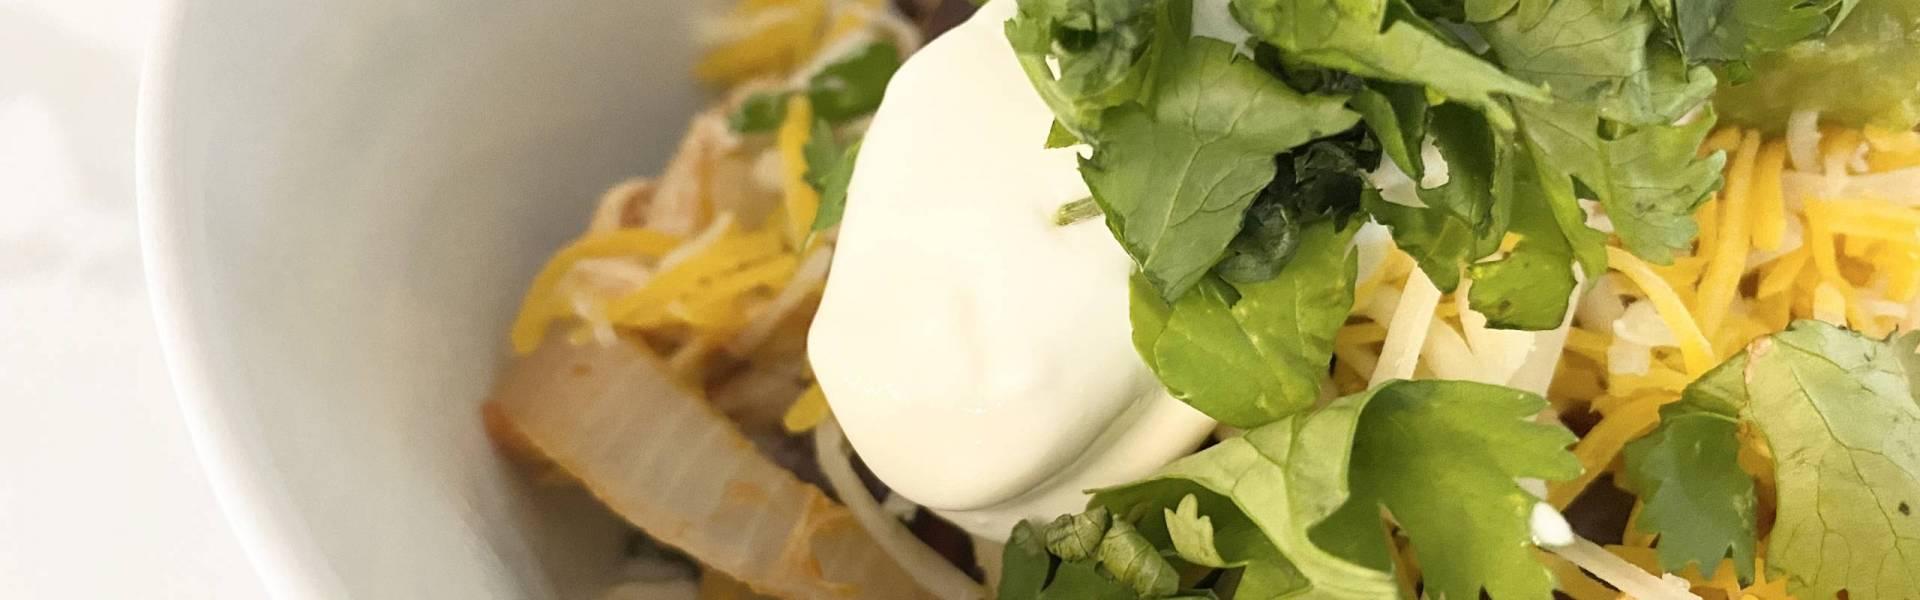 Homemade Chicken Burrito Bowls with Cilantro Lime Rice